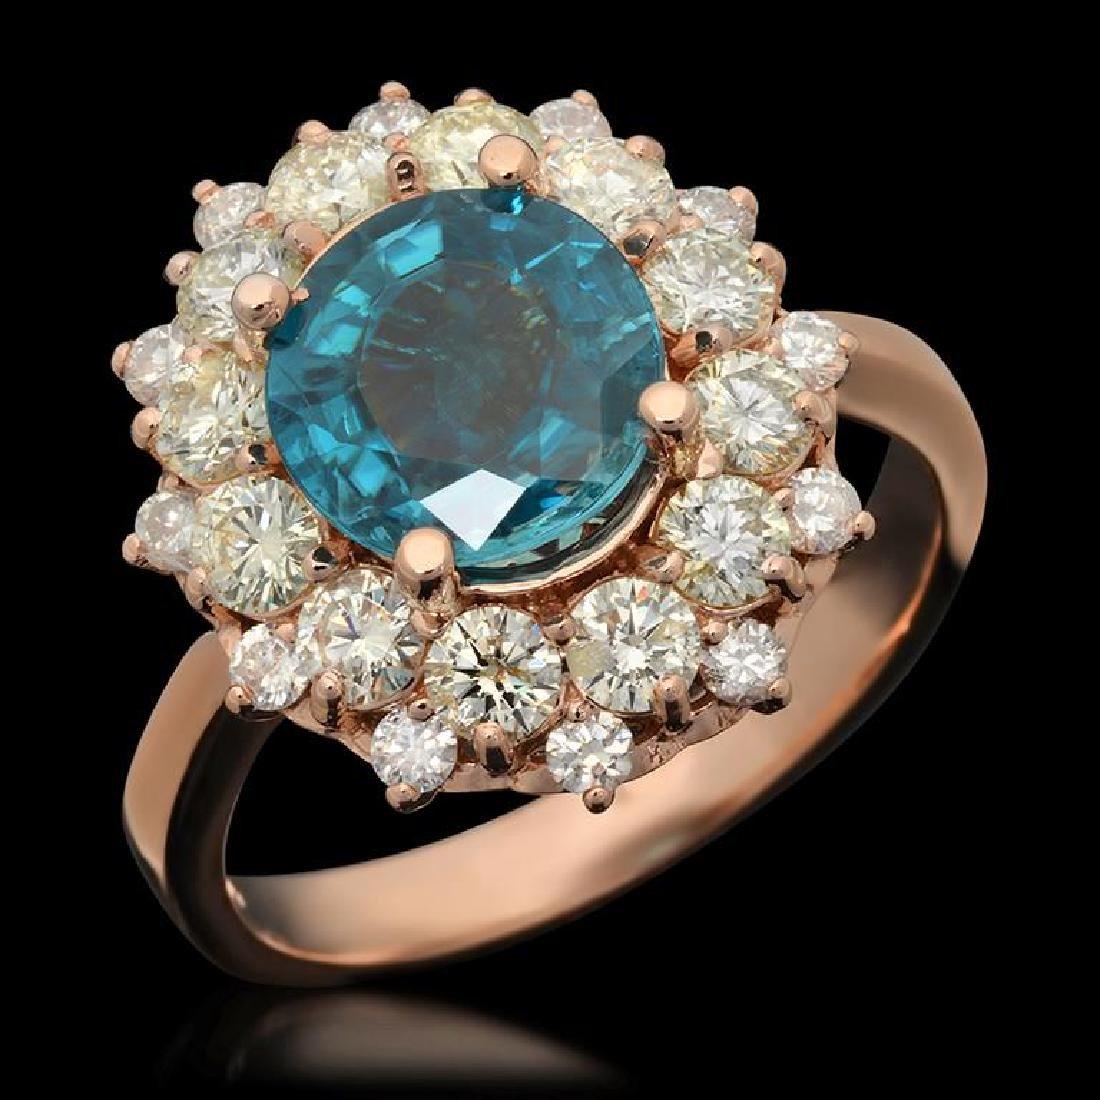 14k Gold 3.07ct Zircon & 1.51ct Diamond Ring